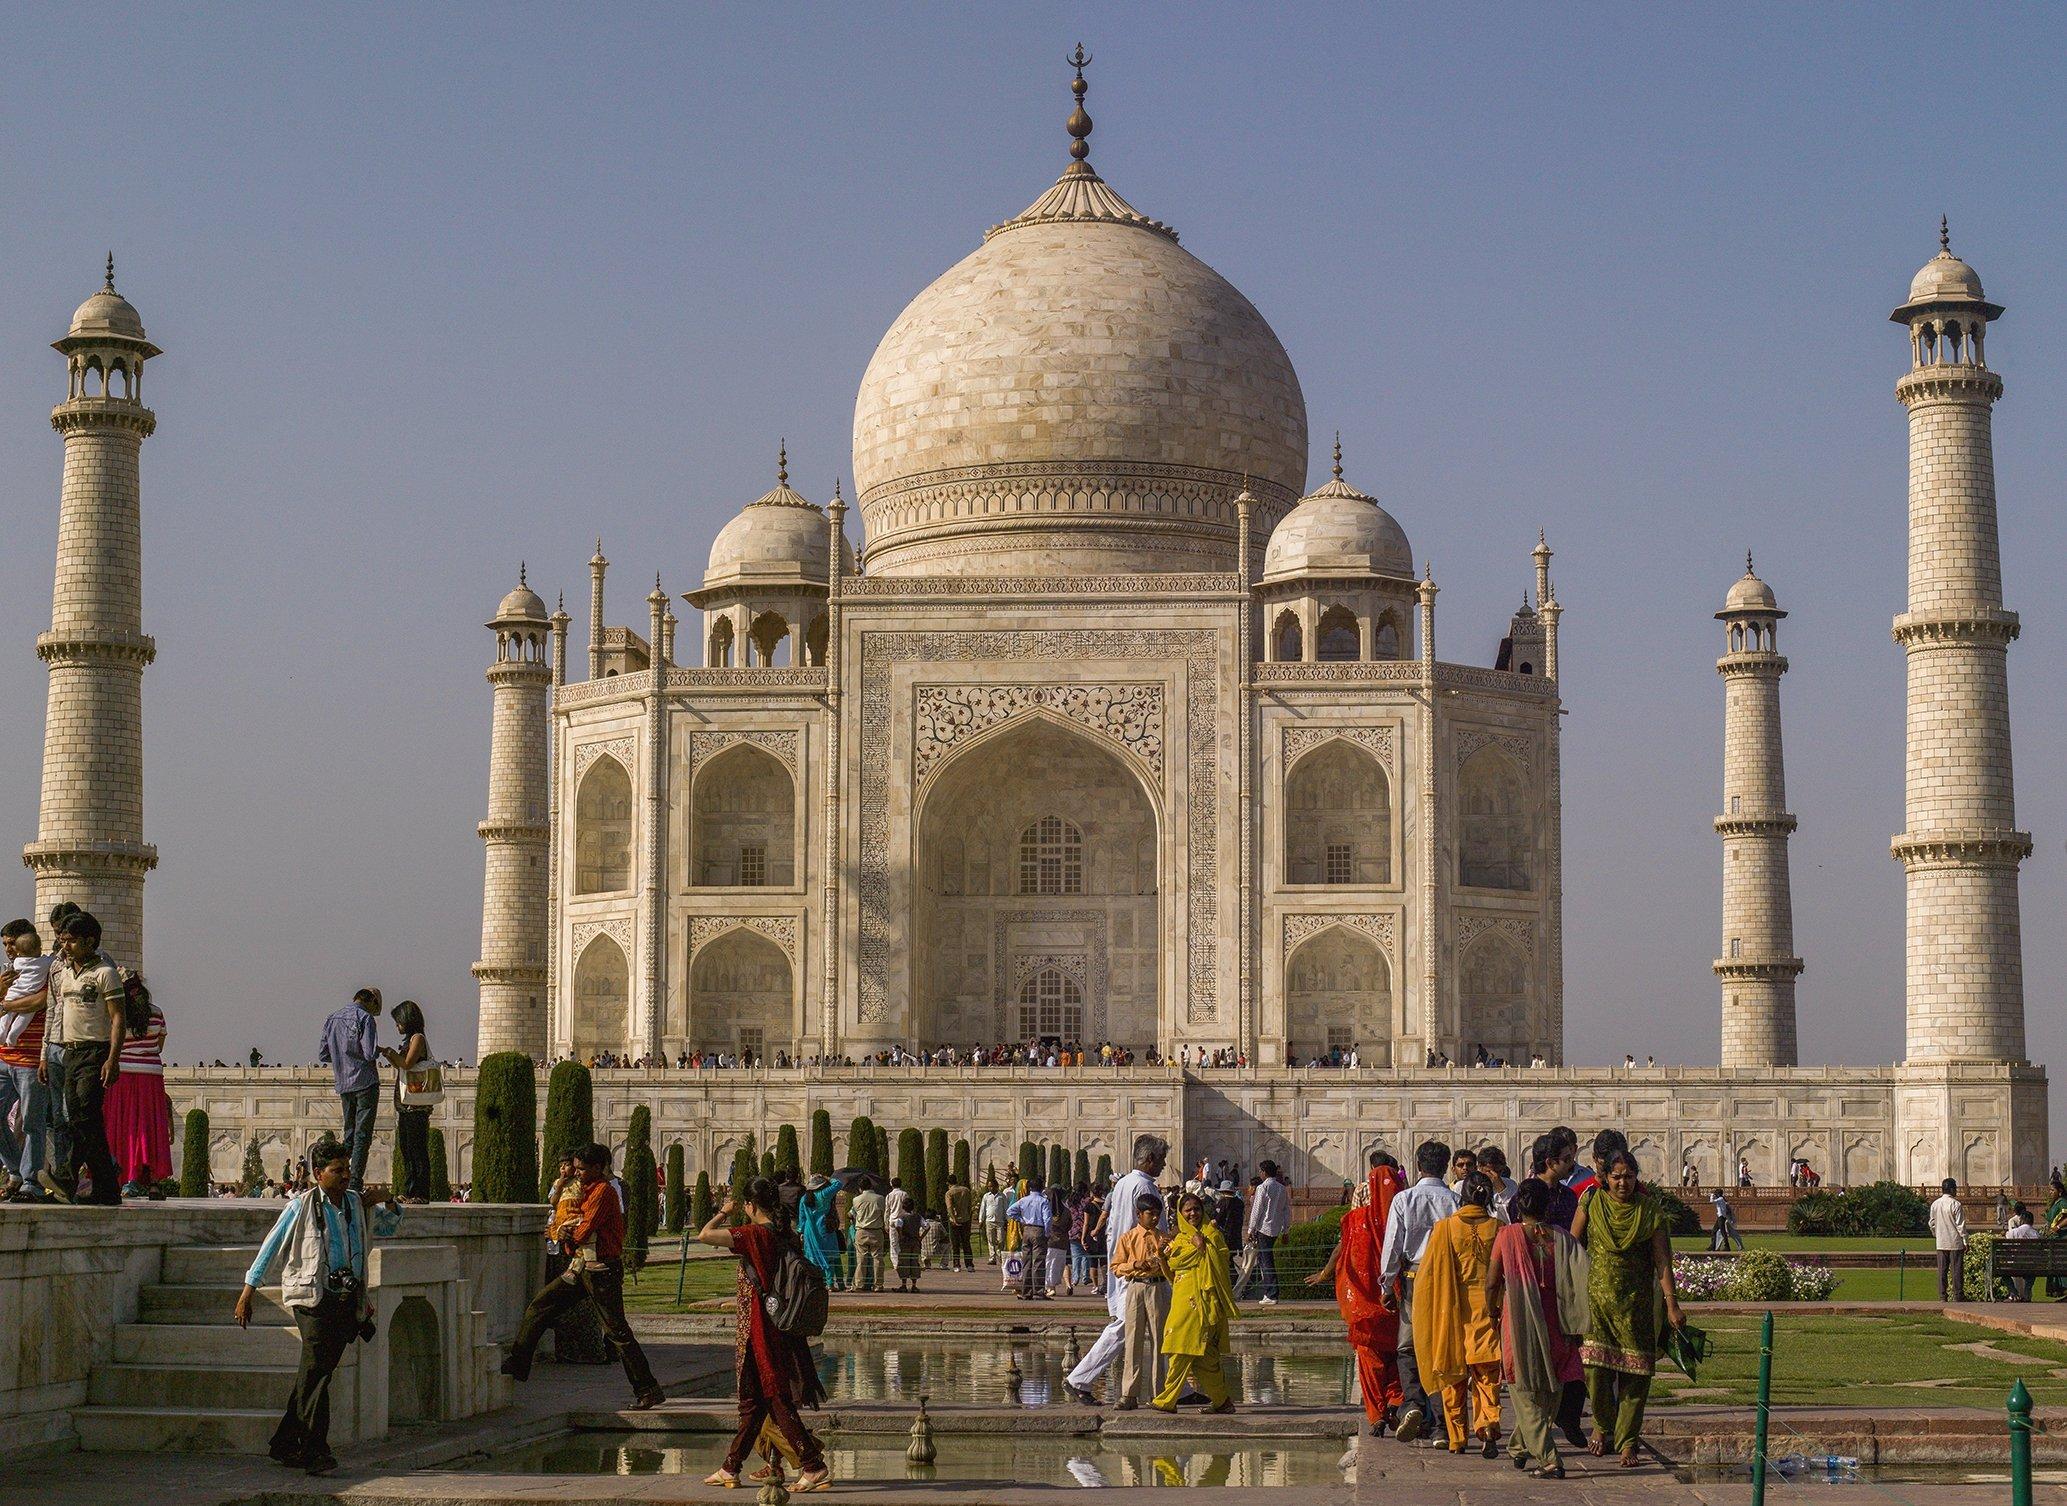 A photo of the Taj Mahal in India by Orhan Durgut. (AA PHOTO)